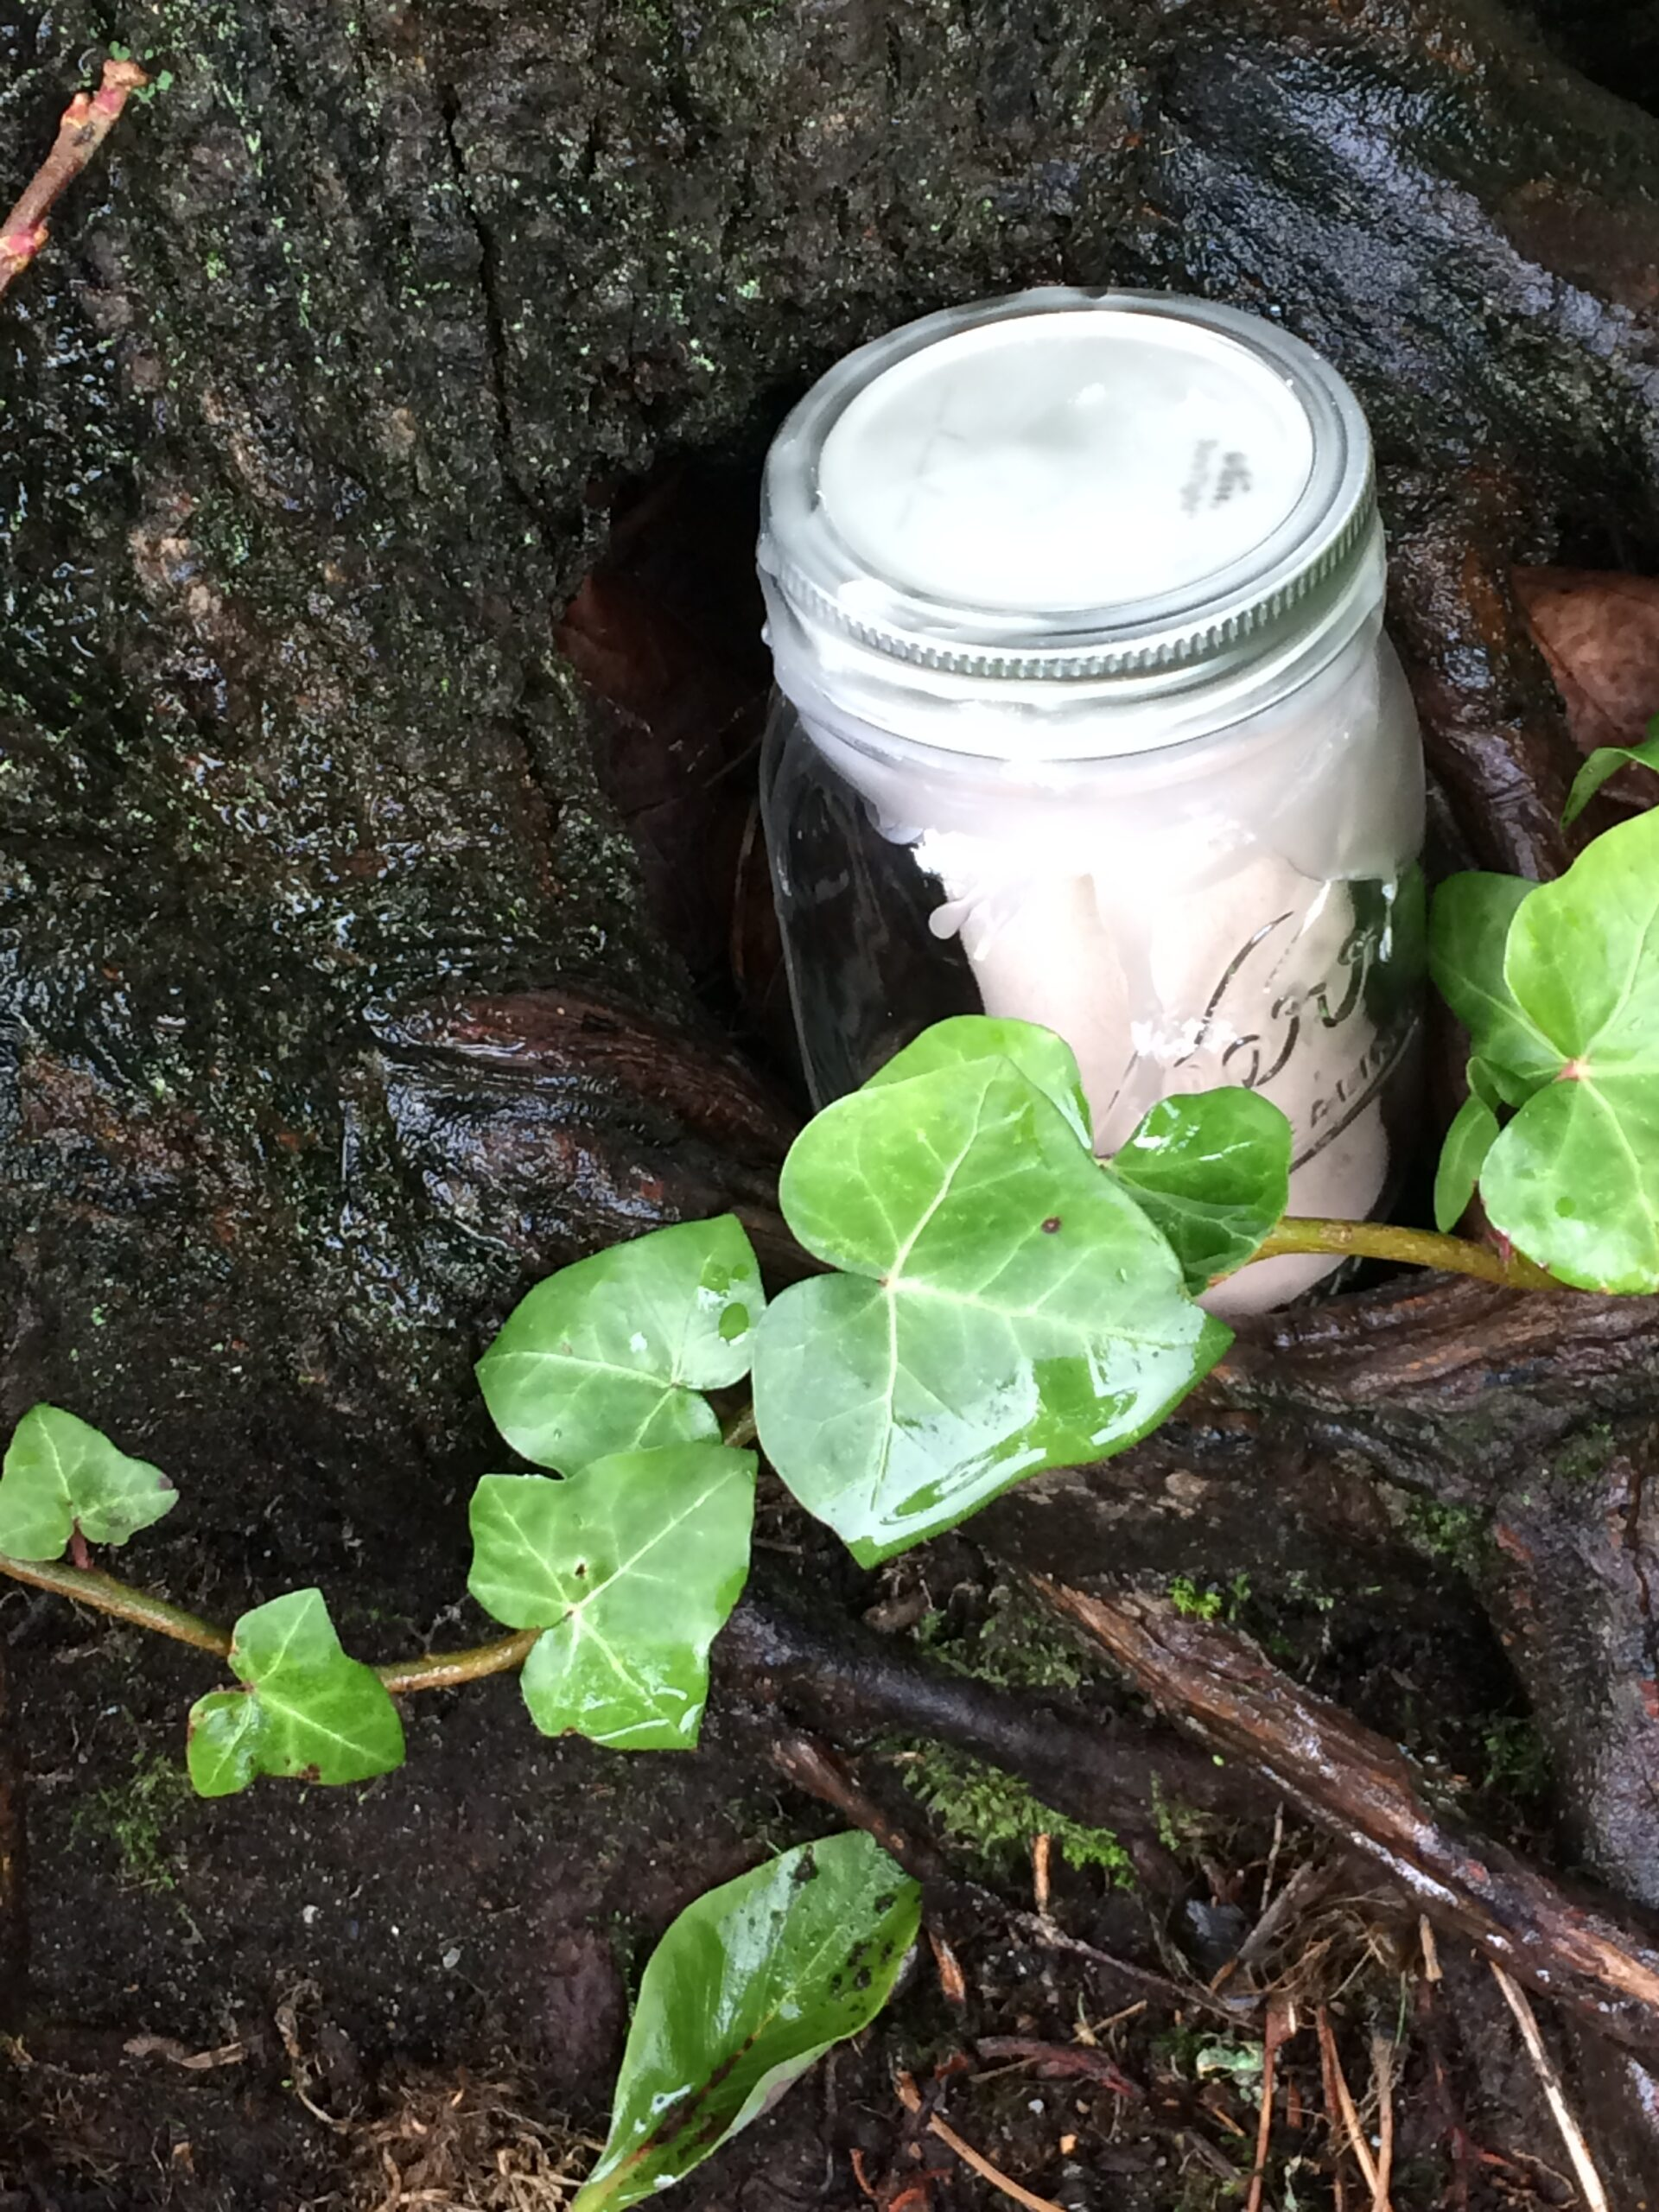 mason jar hidden in tree hollow